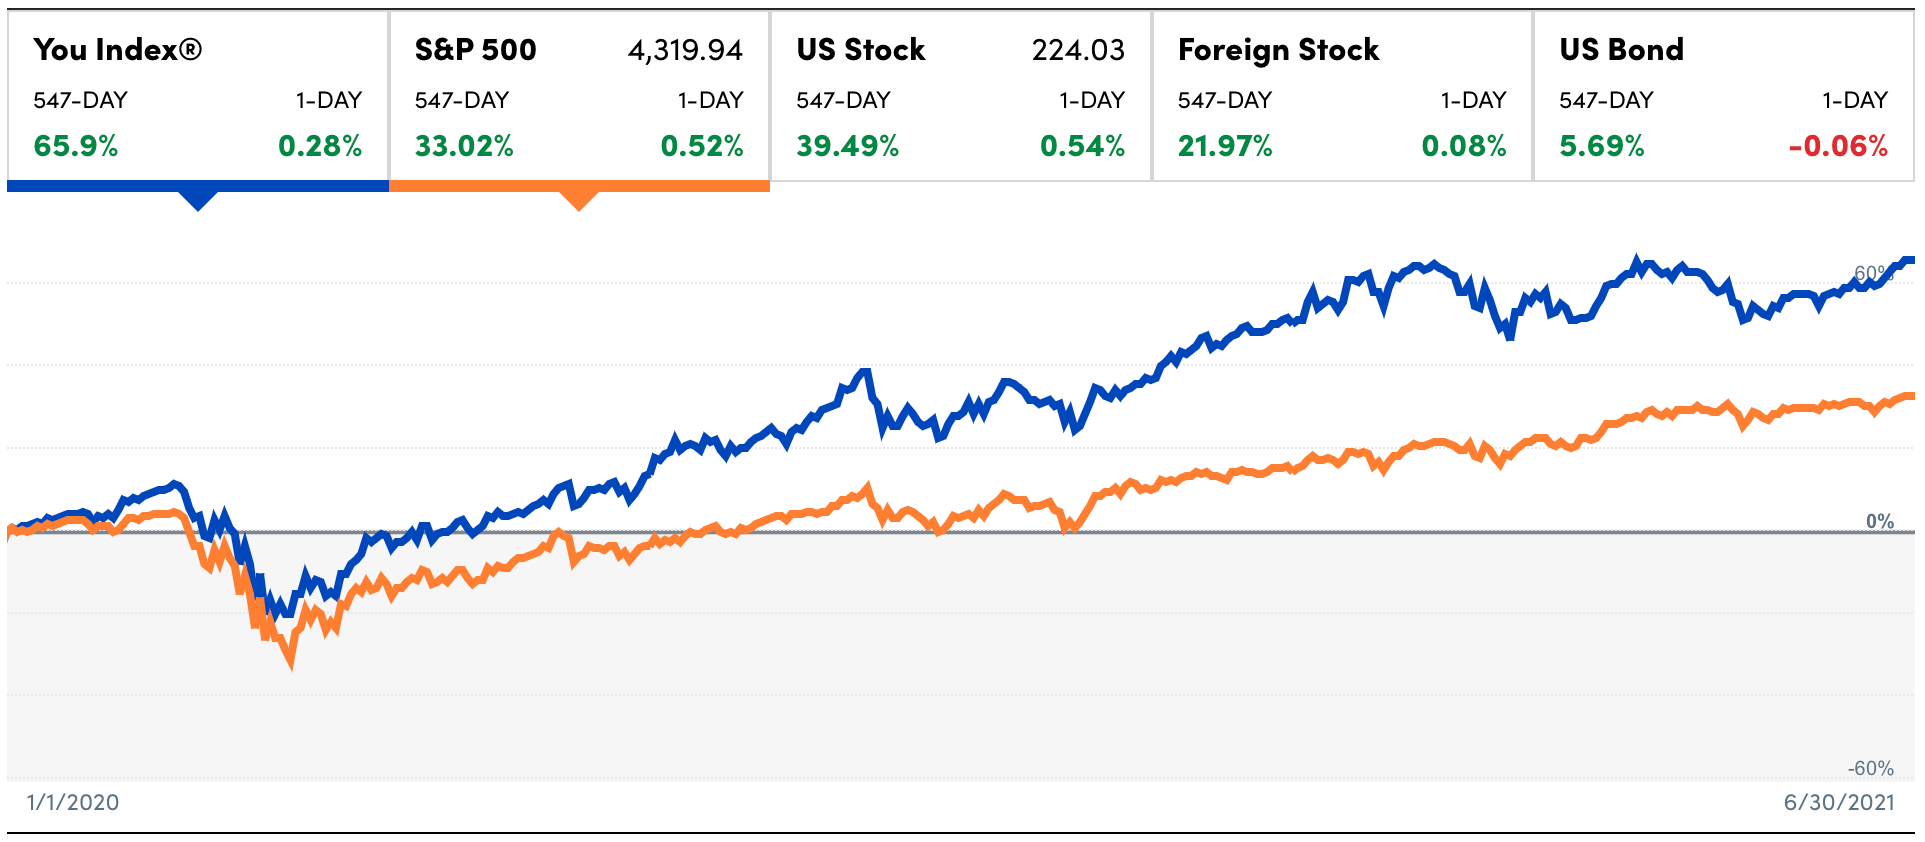 Financial Samurai investment performance since January 1, 2020